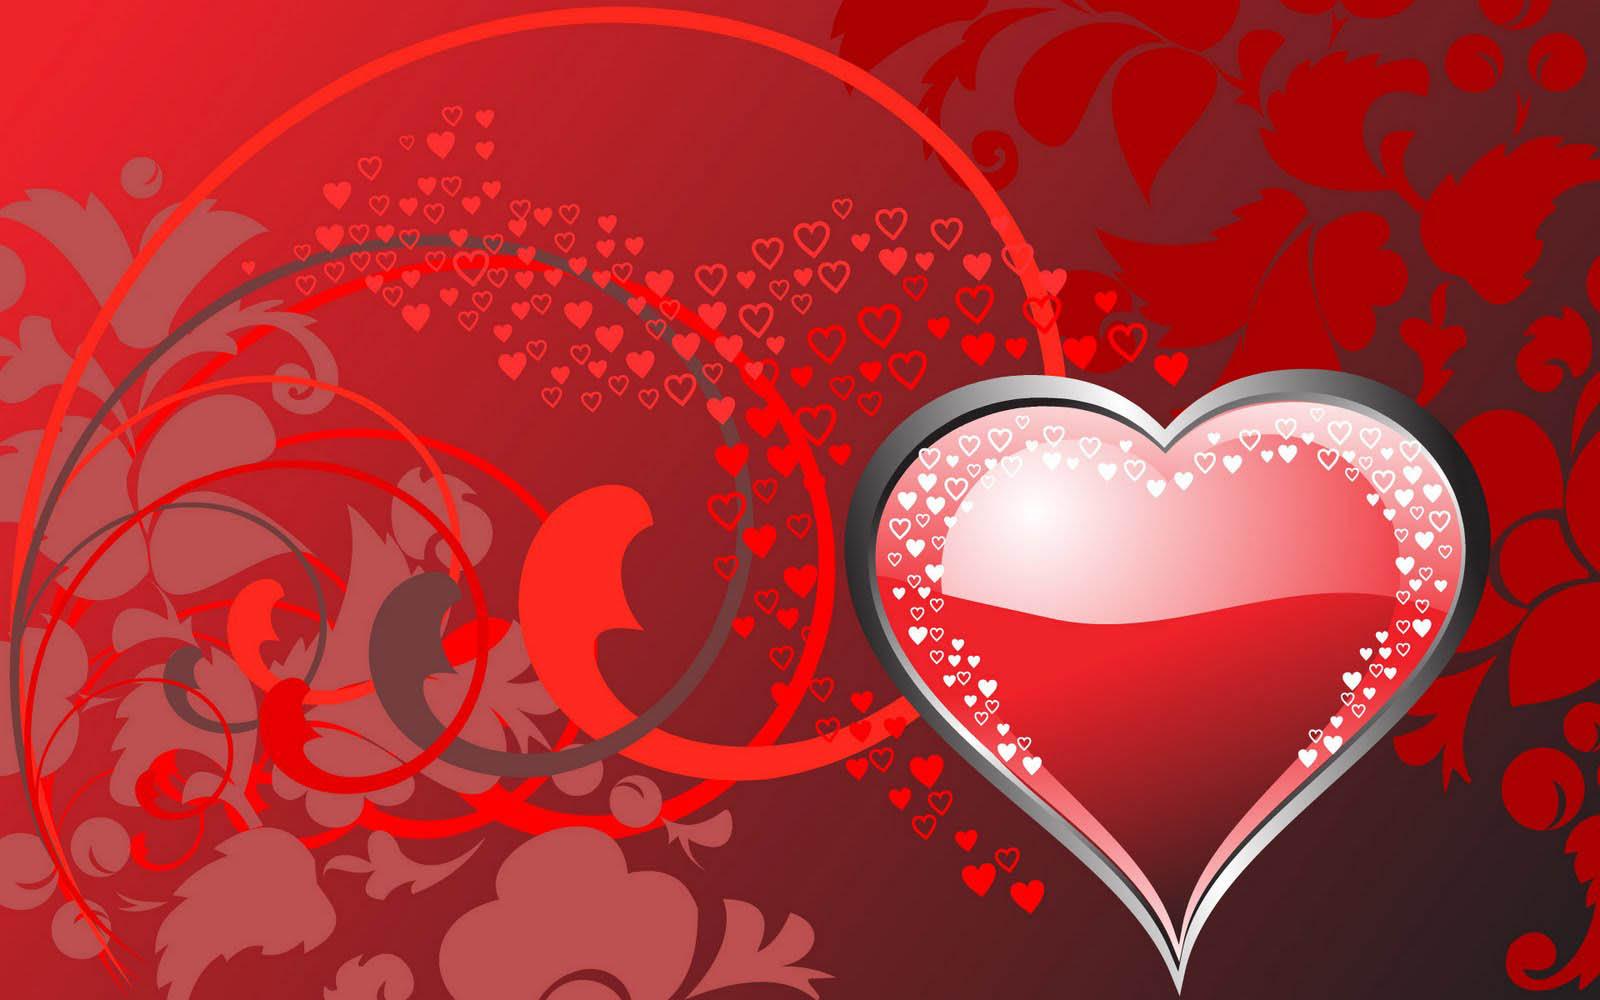 Beautiful Love Heart Wallpaper Hd Pics One Hd Wallpaper February